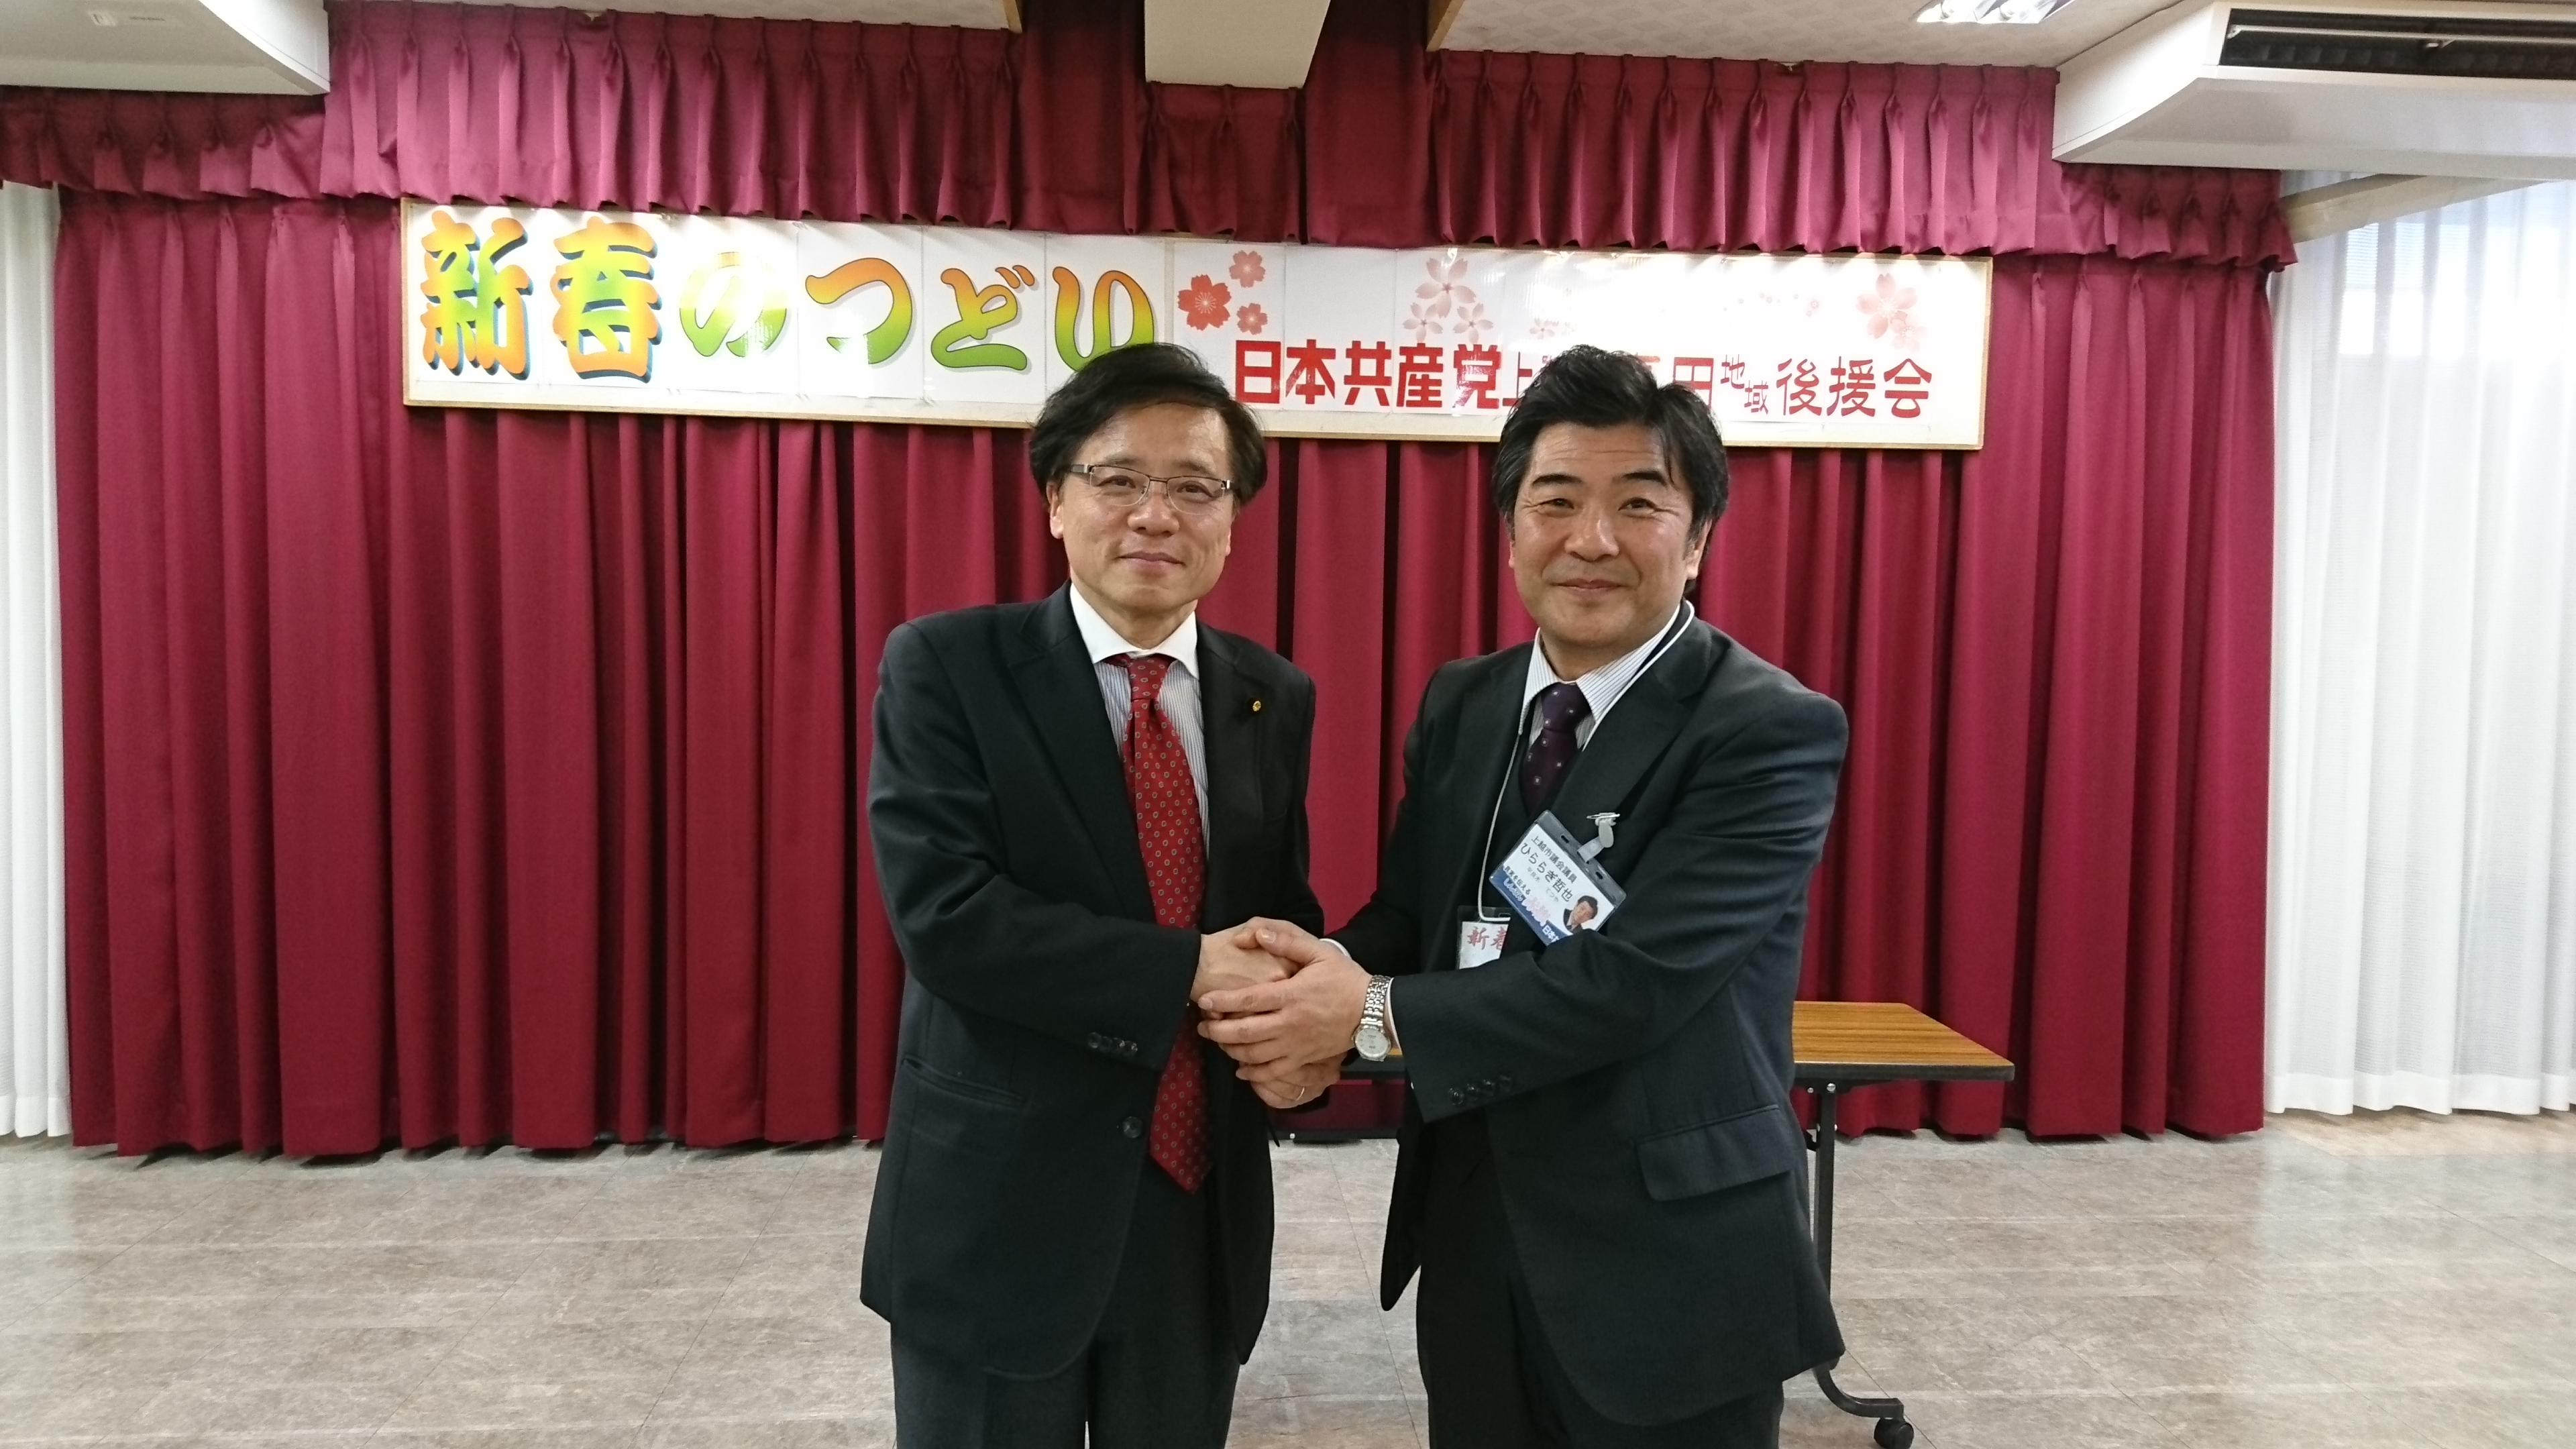 http://www.inoue-satoshi.com/diary/DSC_0670.JPG